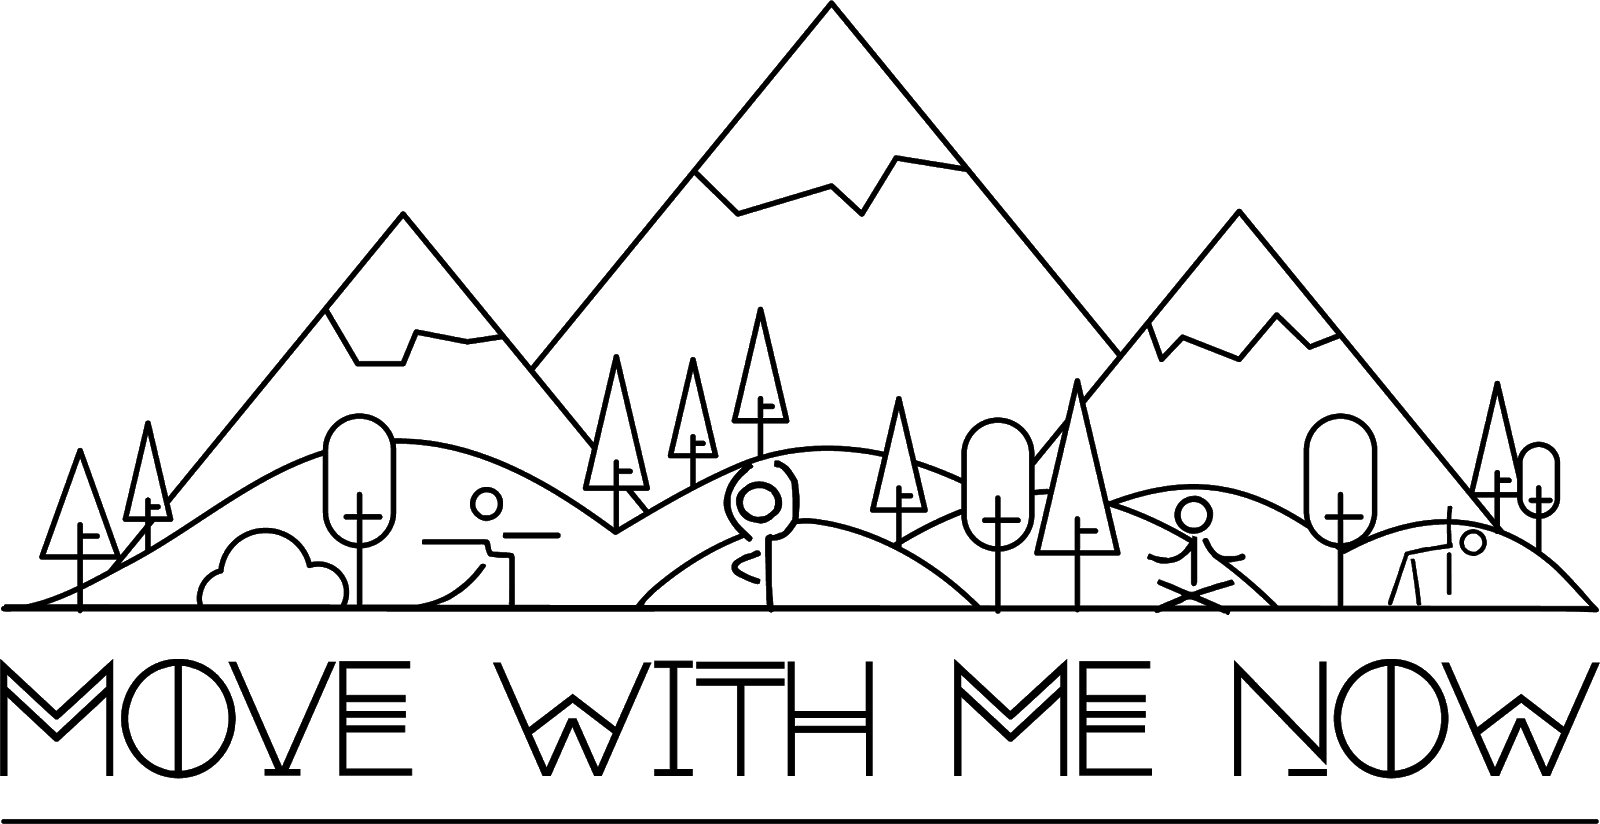 MWMN_LogoBlack.png